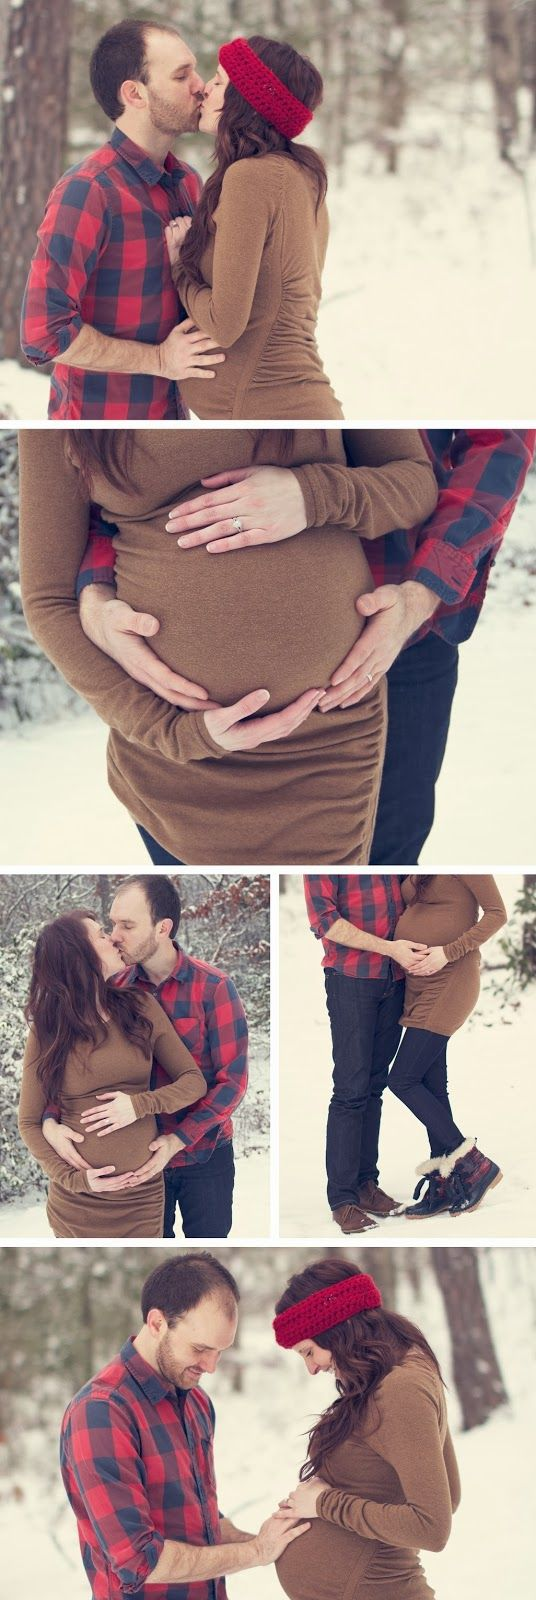 our maternity shoot in the snow via.... http://writtenonsandpaper.blogspot.com